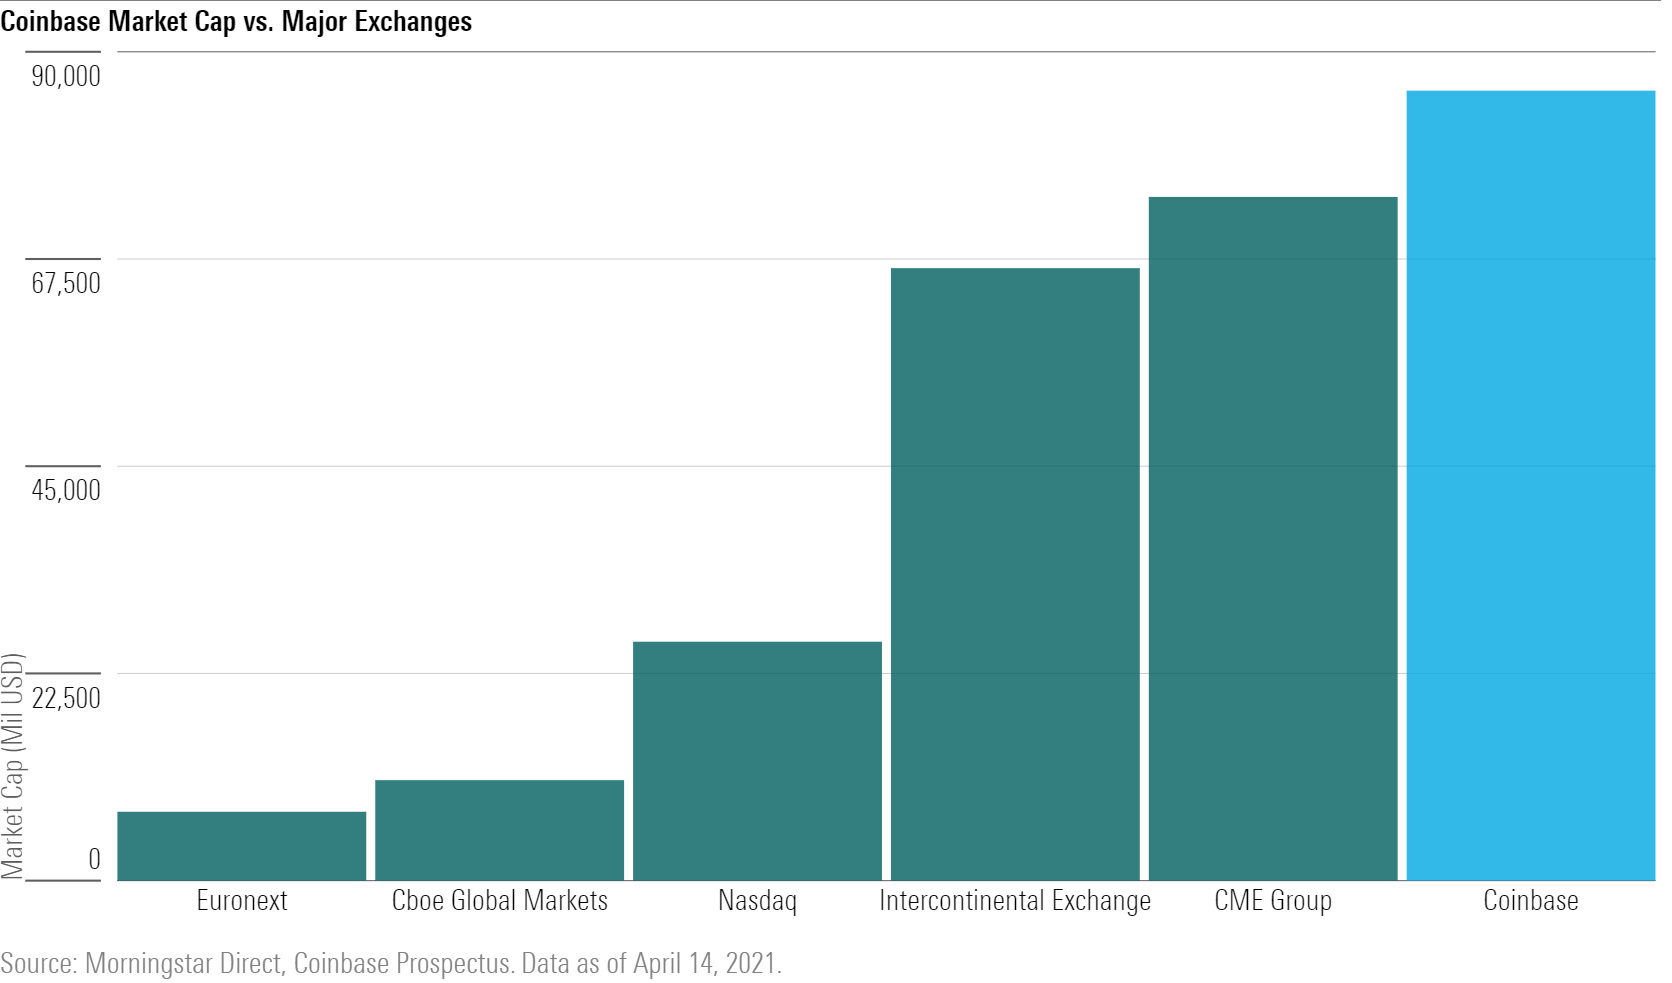 Coinbase market cap v major exchanges